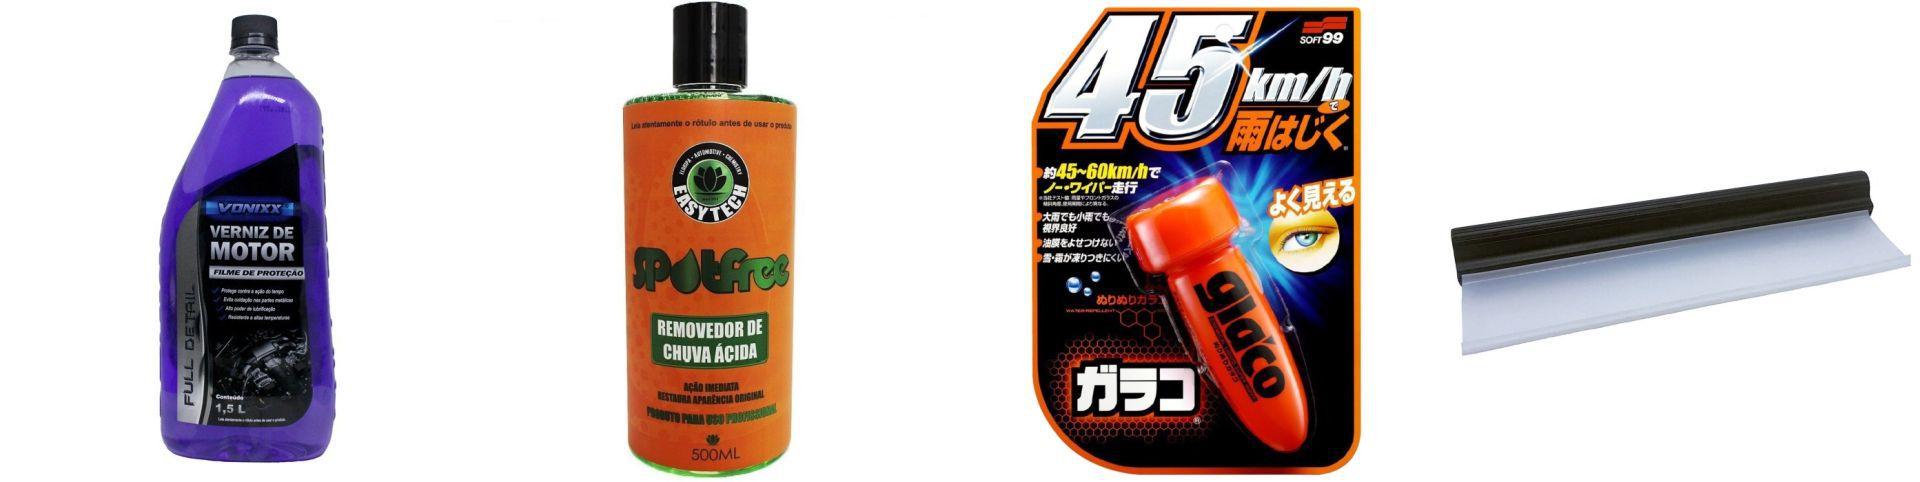 Kit Rodo+ Glaco Roll On 75ml+Removedor Spotfree+Verniz de Motor